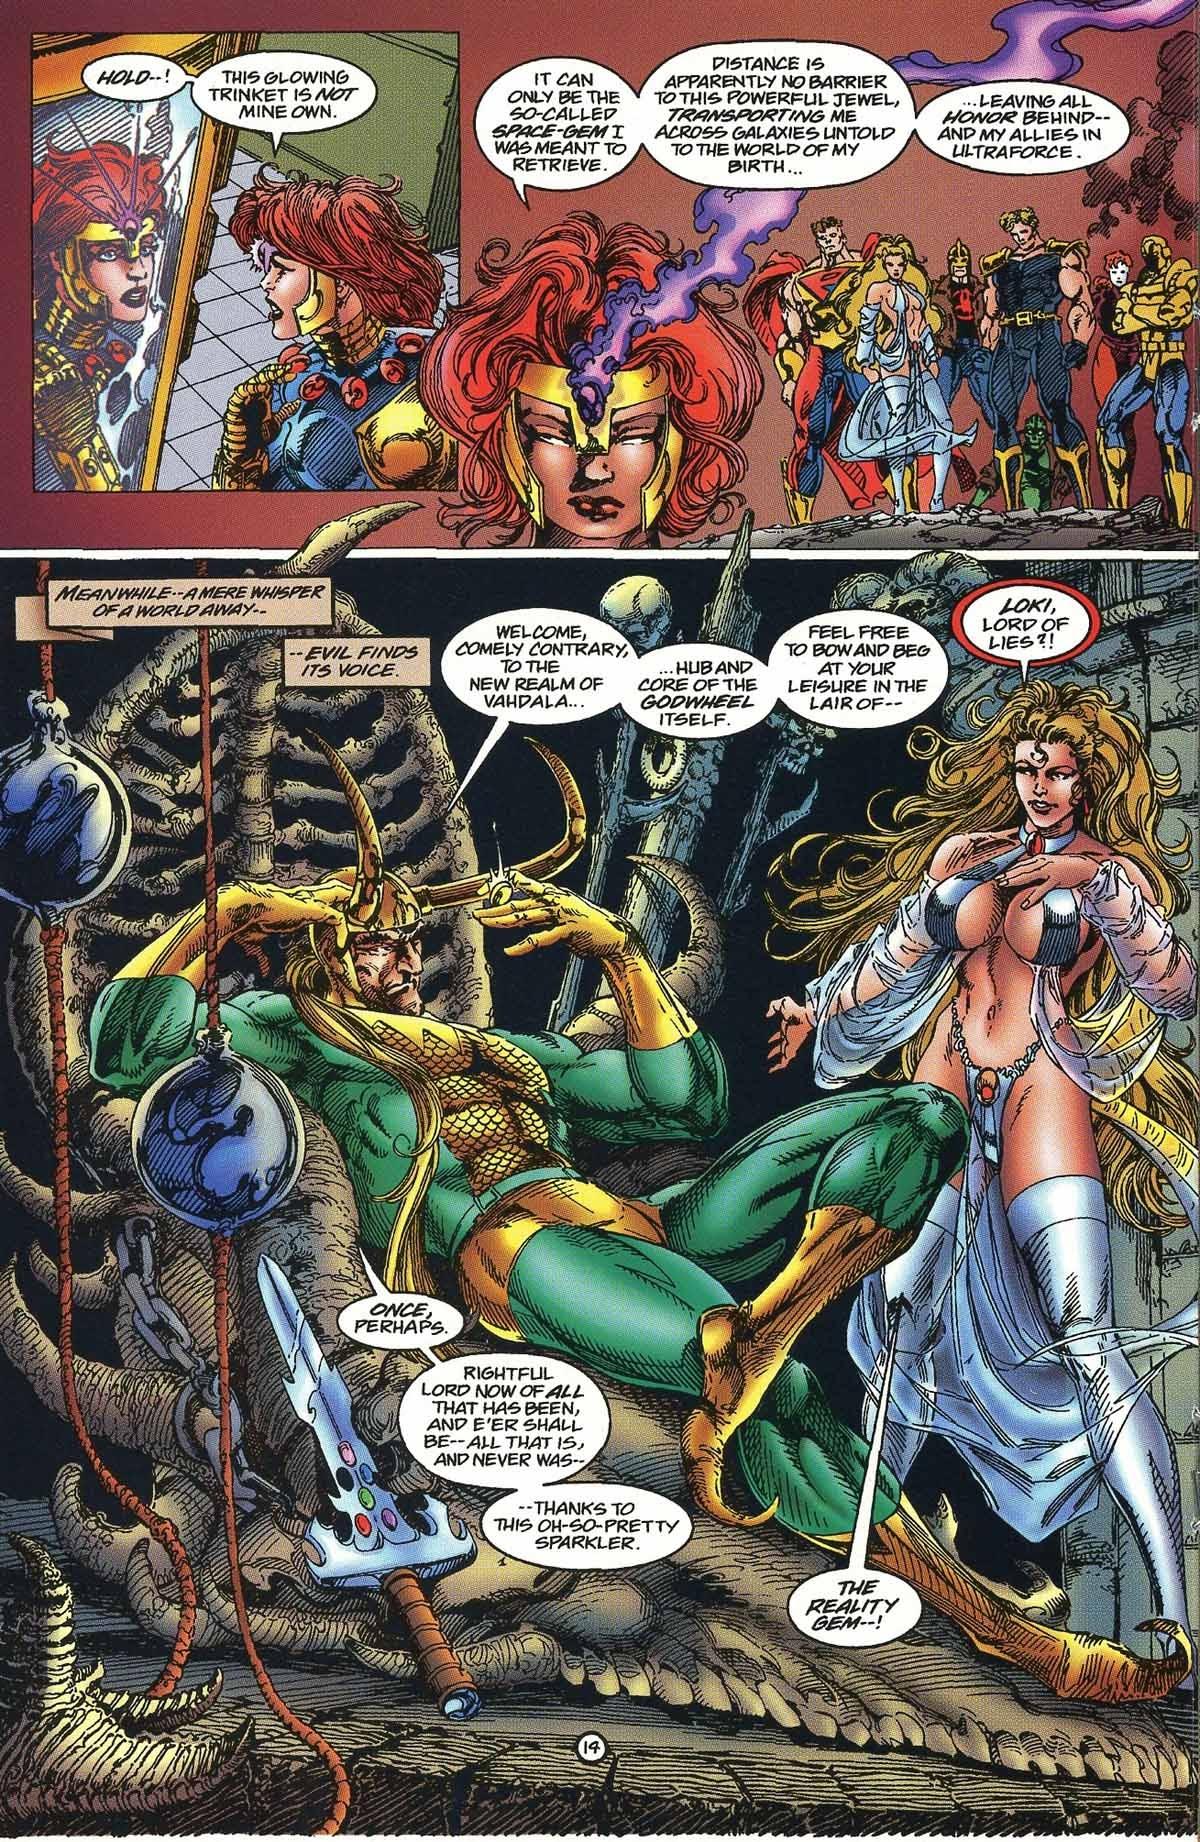 Read online UltraForce/Avengers comic - Issue # _Prelude 11